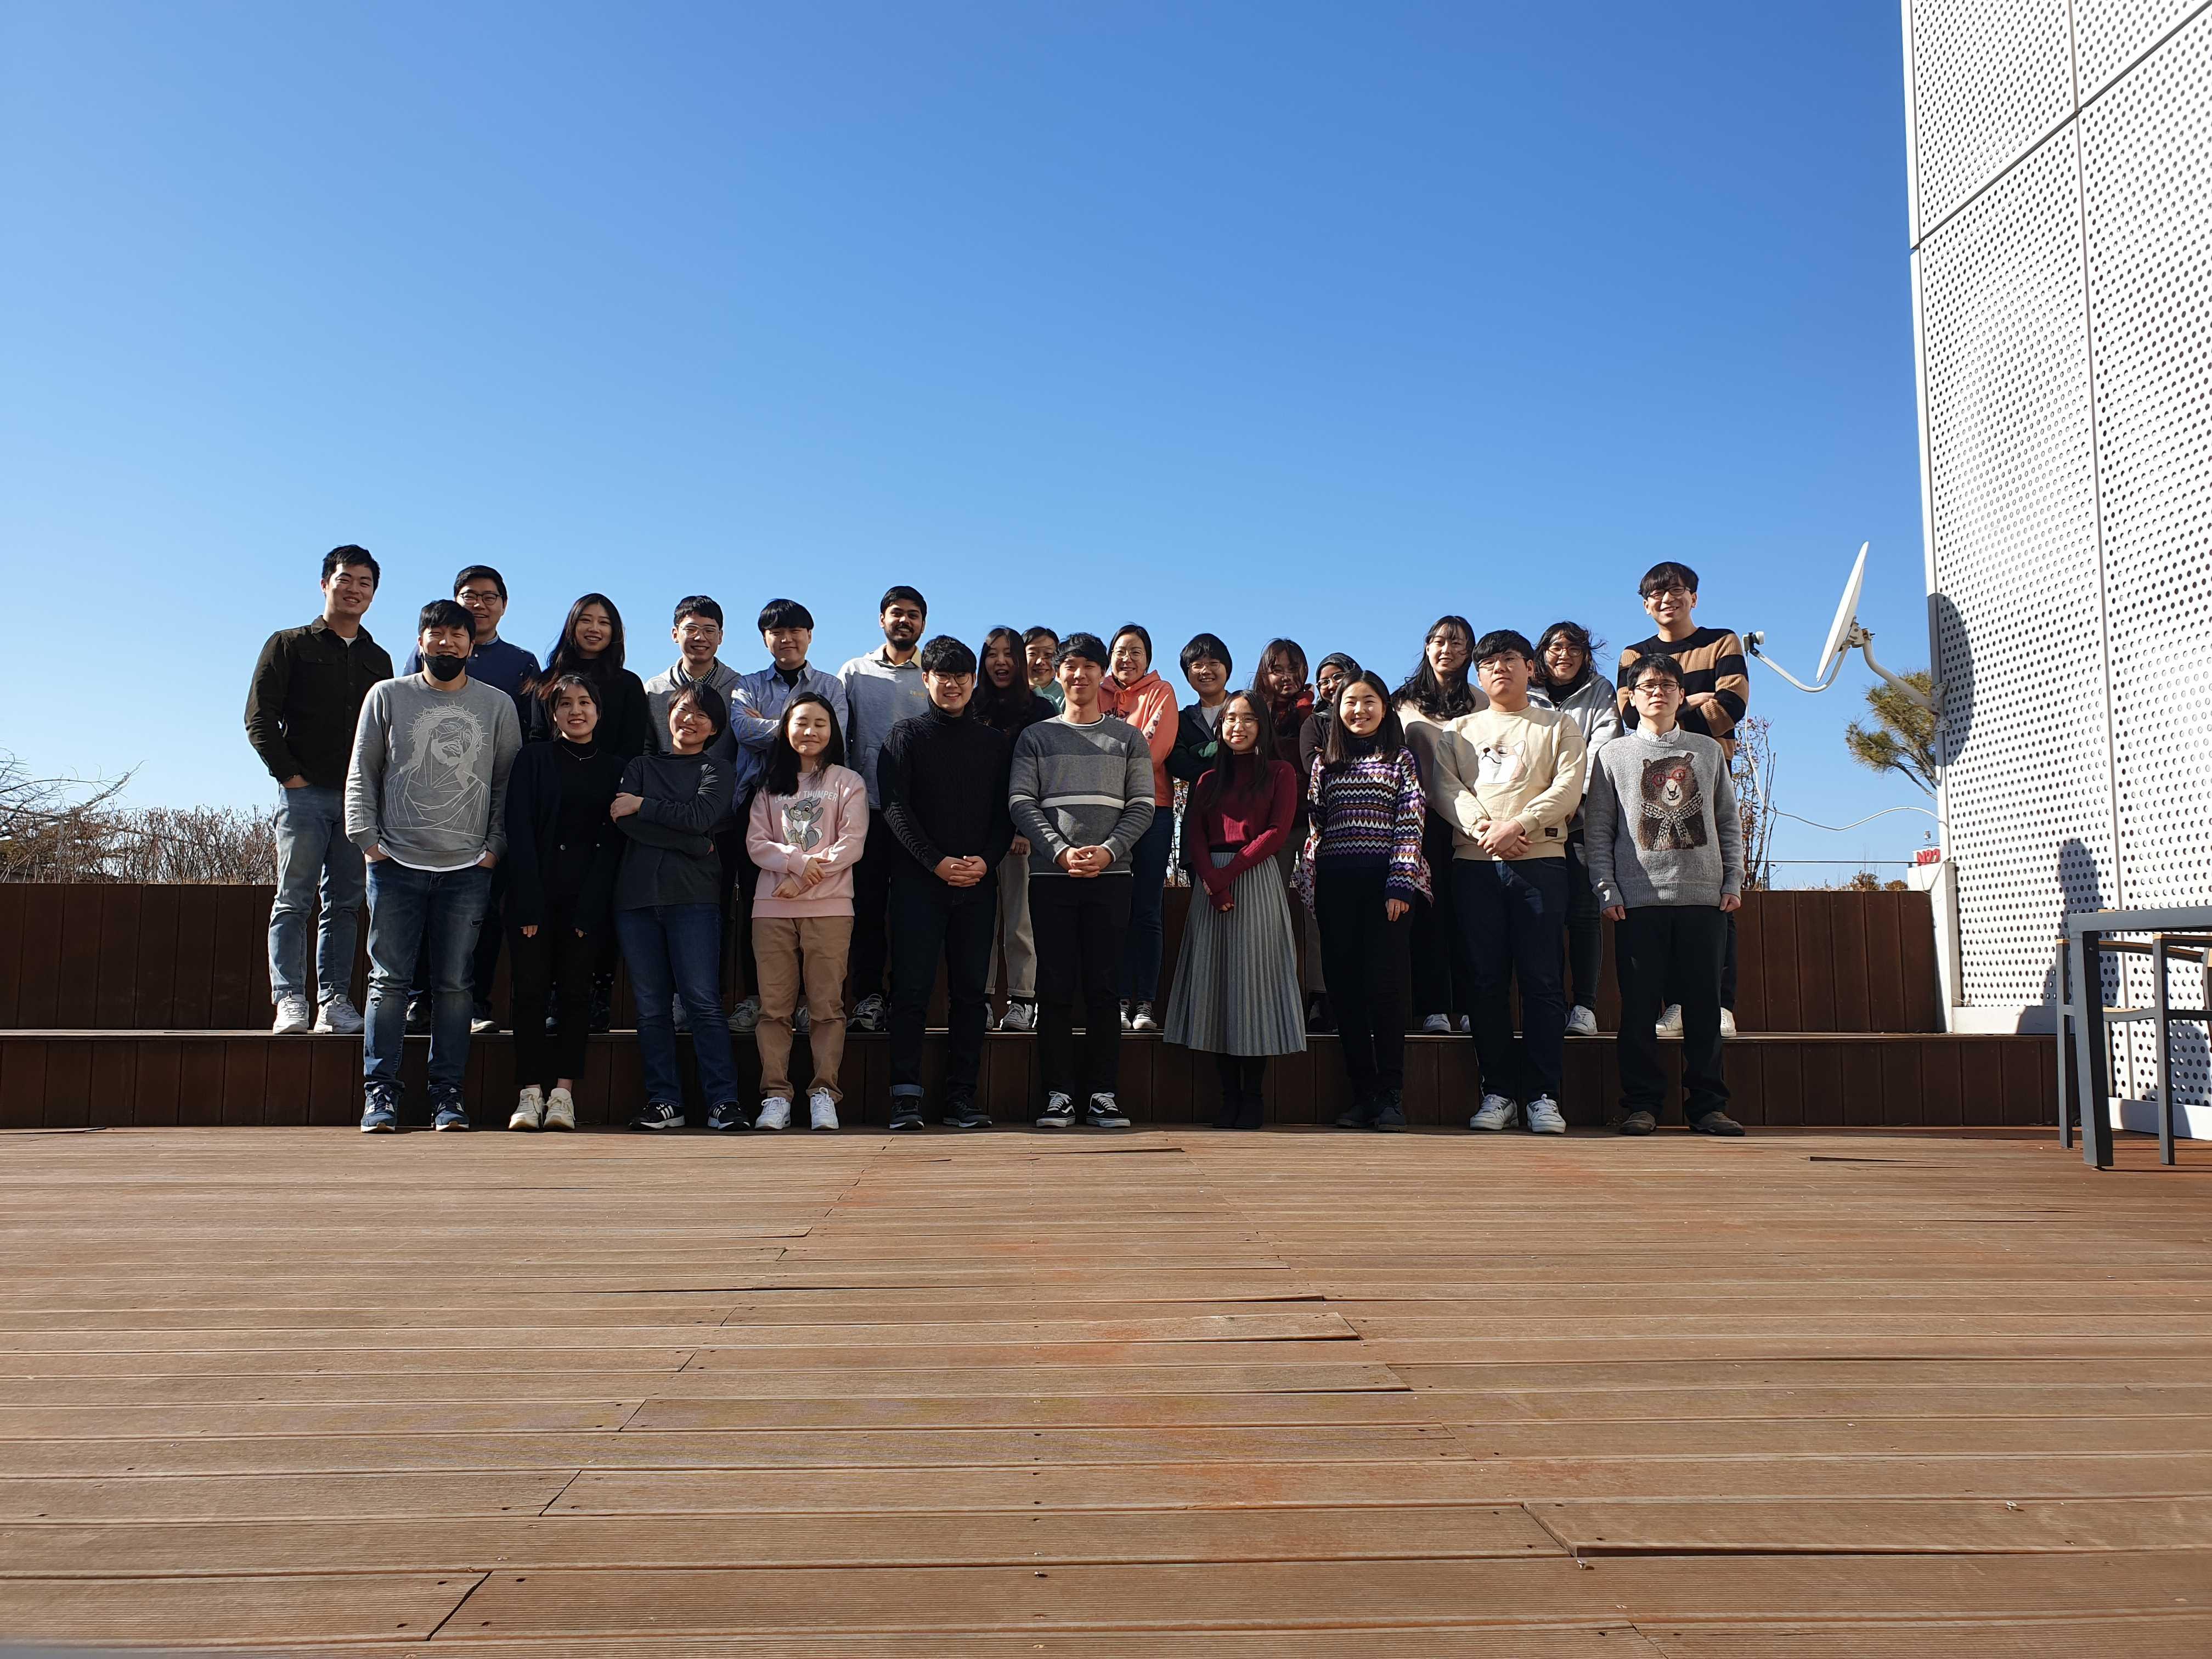 Photo of KIXLAB group, Feburary, 2020